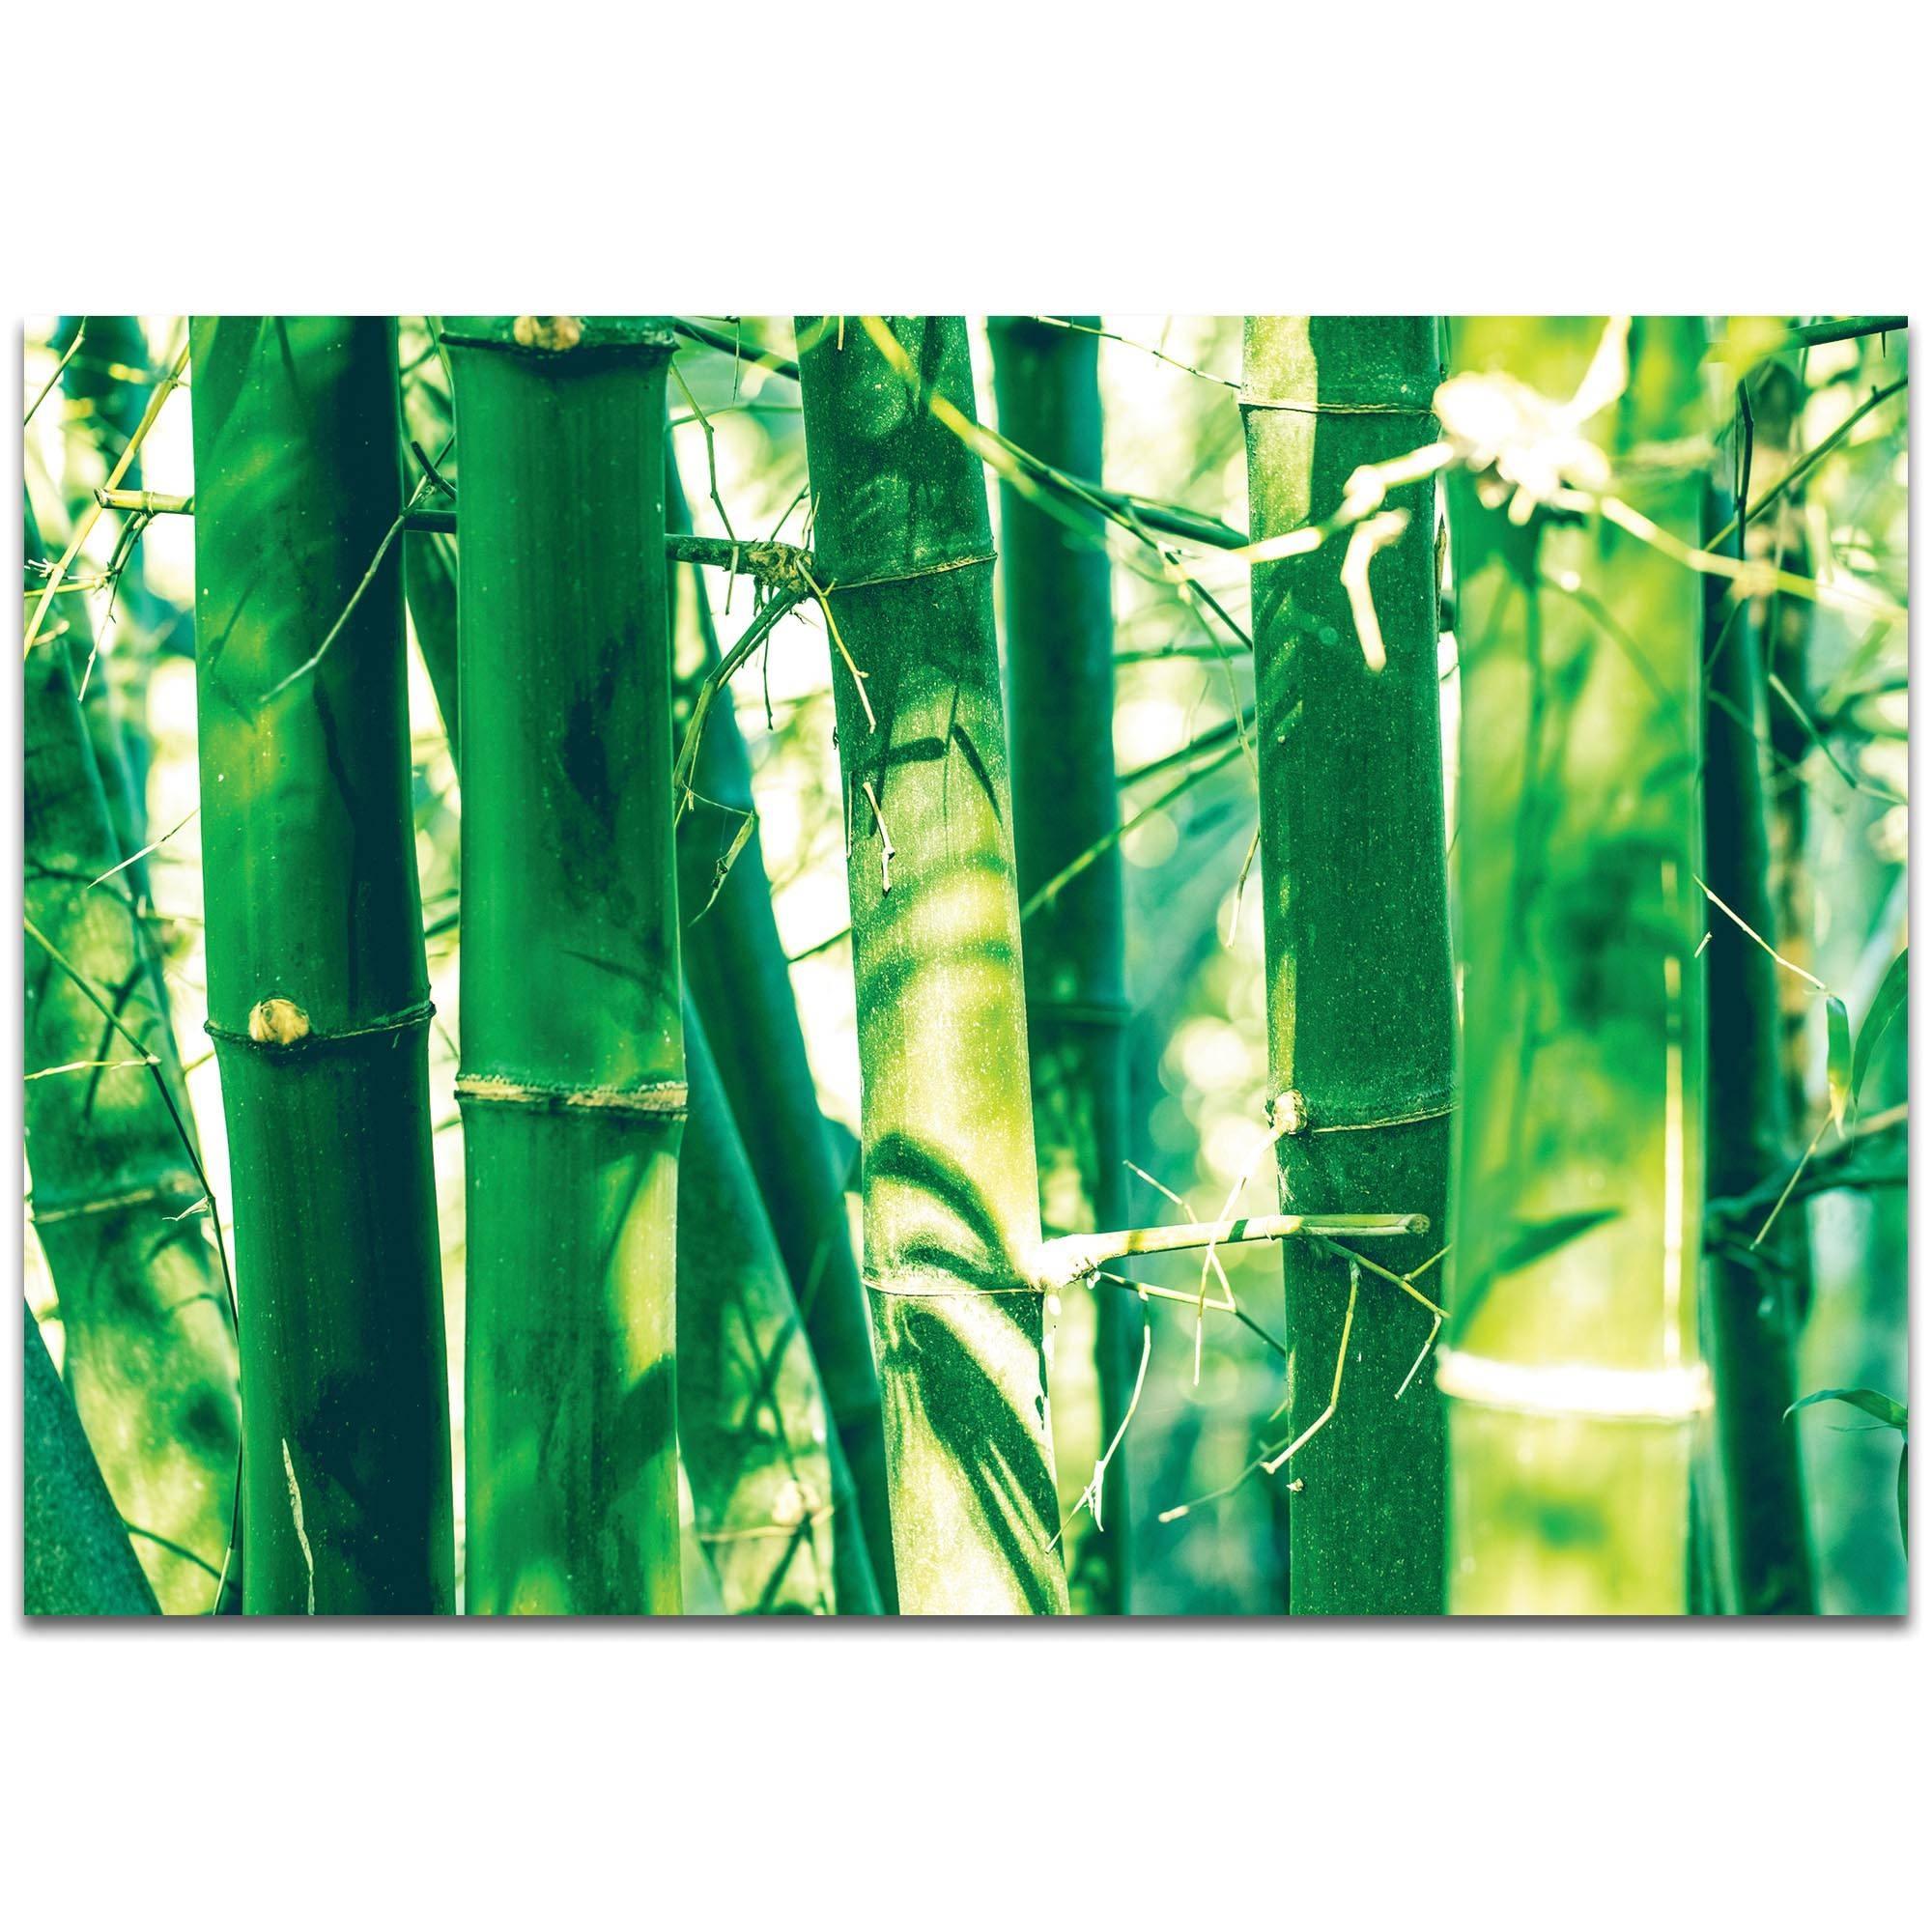 Metal Art Studio – Bamboo Forestmeirav Levy – Nature Regarding Most Current Bamboo Metal Wall Art (View 21 of 25)